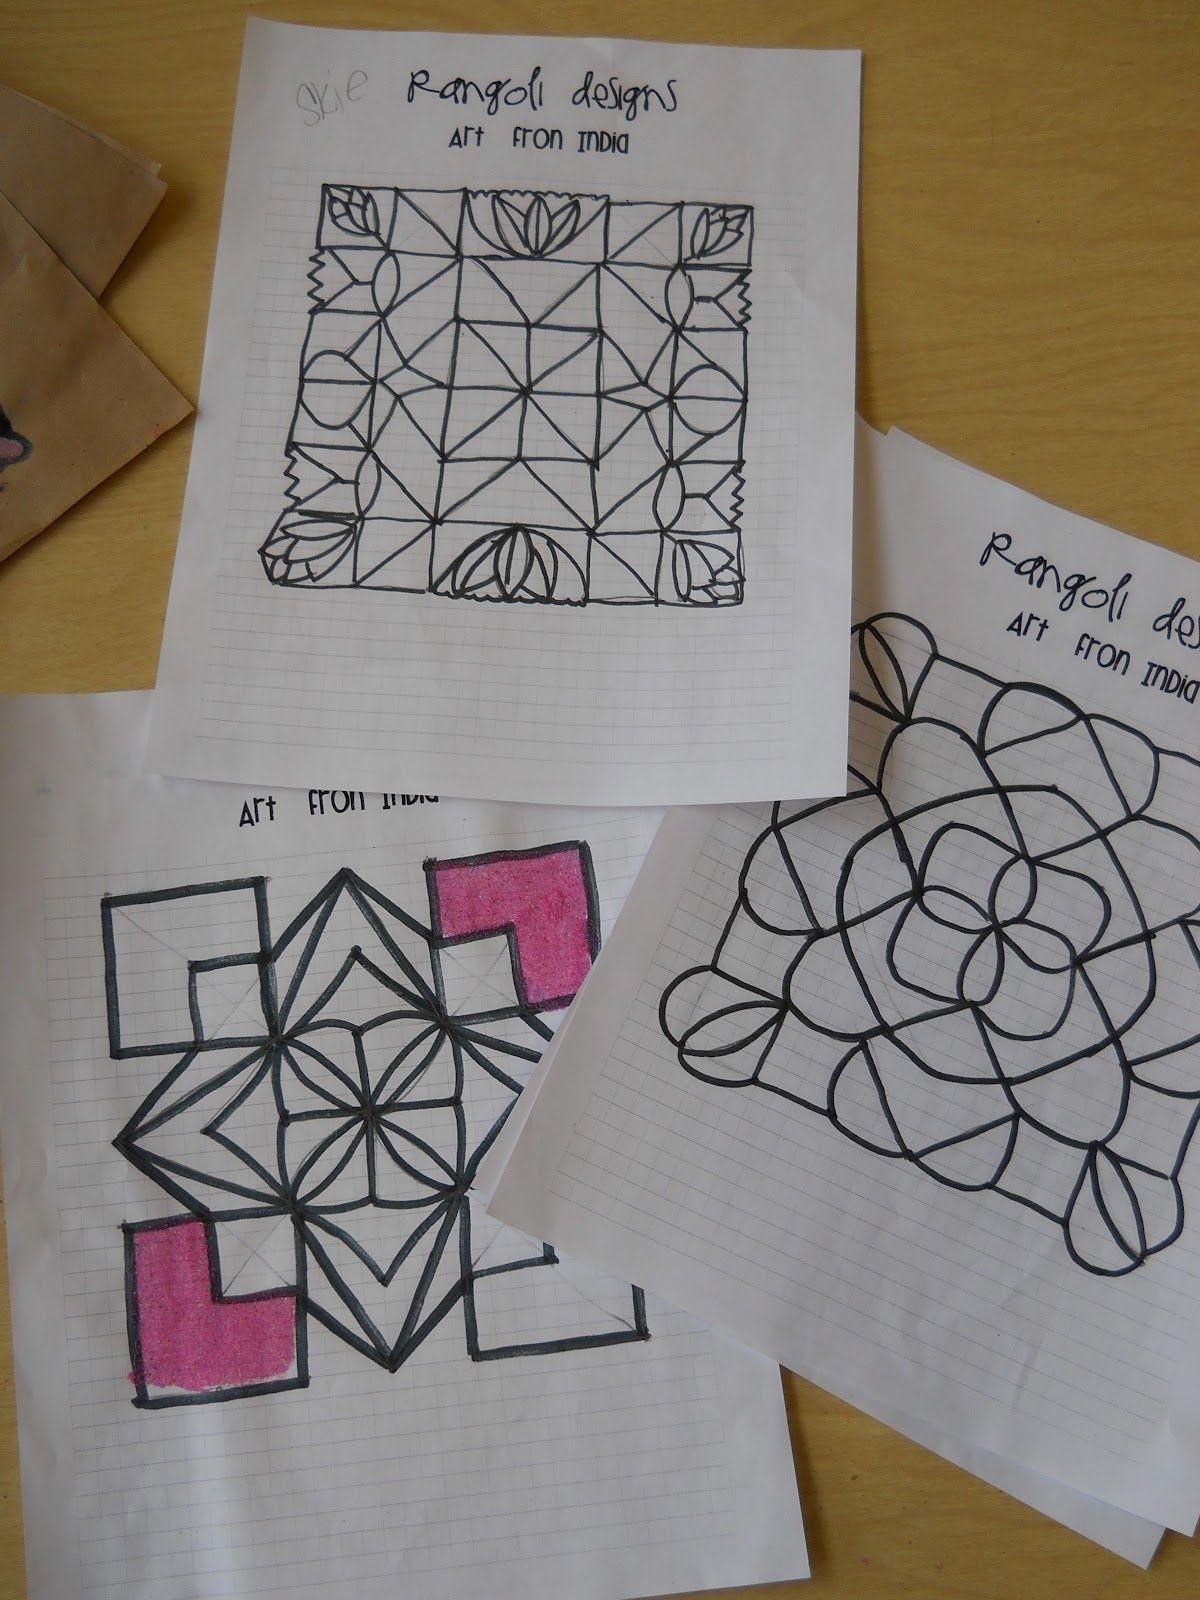 Rangoli Designs From India Elementary Art Elementary Art Rooms